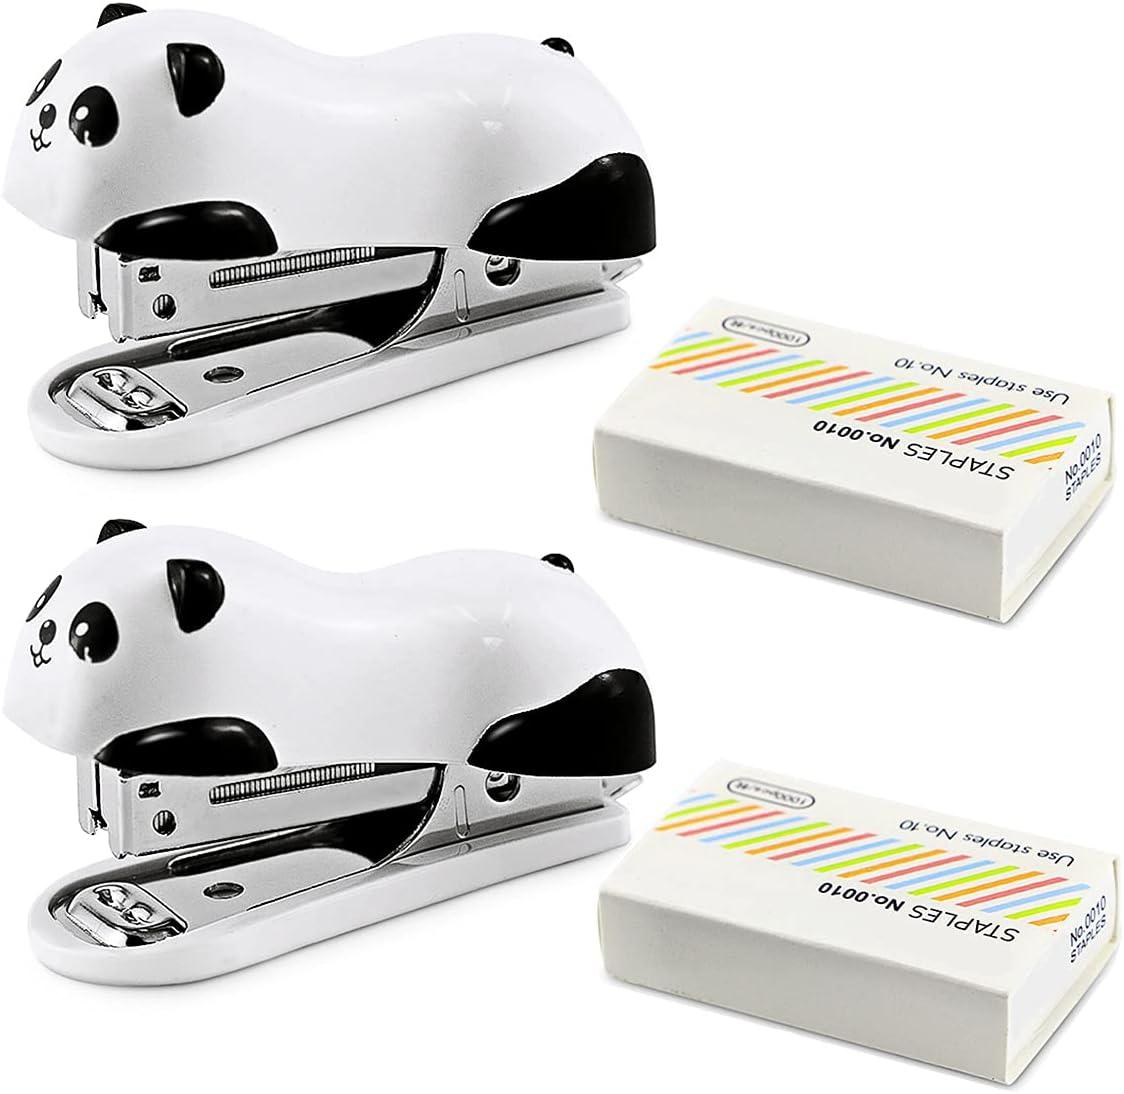 Owevvin 2 Packs Cute Panda Stapler Portabl Rapid rise Max 41% OFF 1000 Staples Pcs and